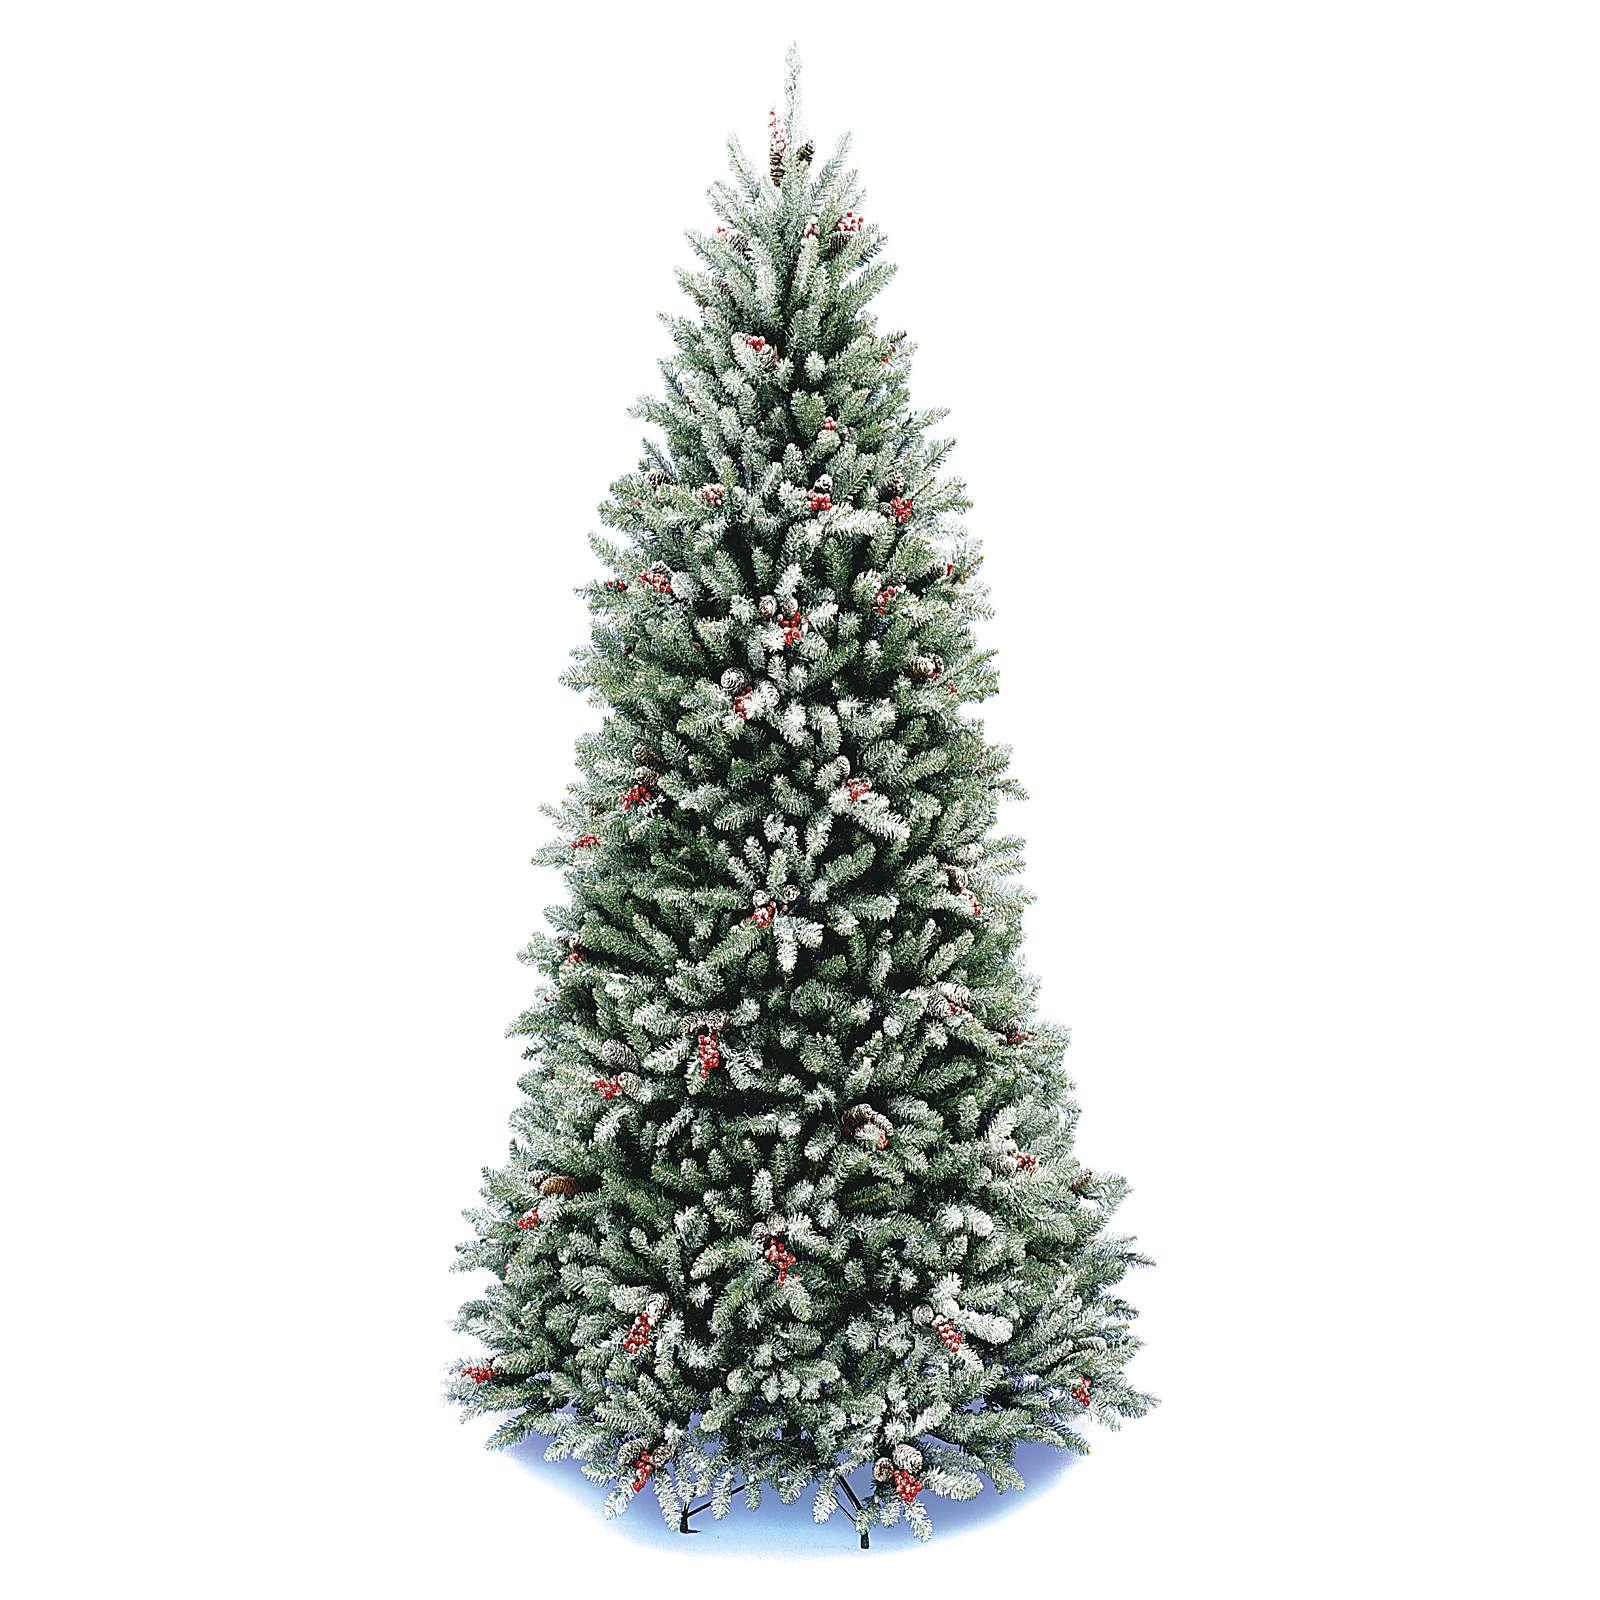 Sapin de Noël 210 cm Slim neige baies pommes pin Dunhill 3